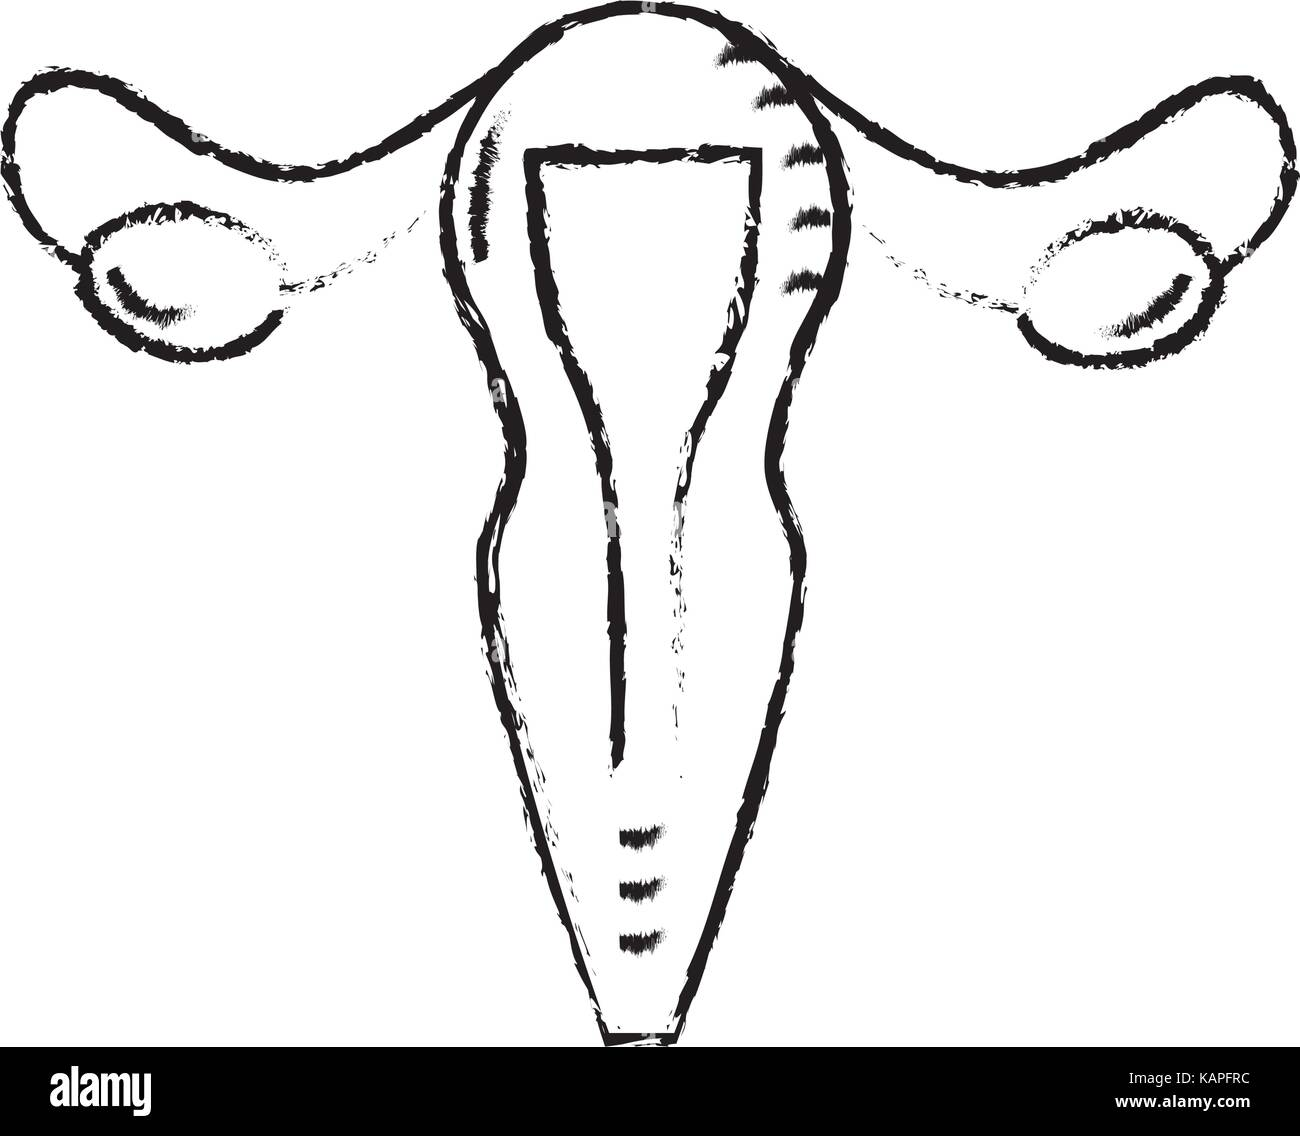 Fallopian Tubes Stockfotos & Fallopian Tubes Bilder - Alamy